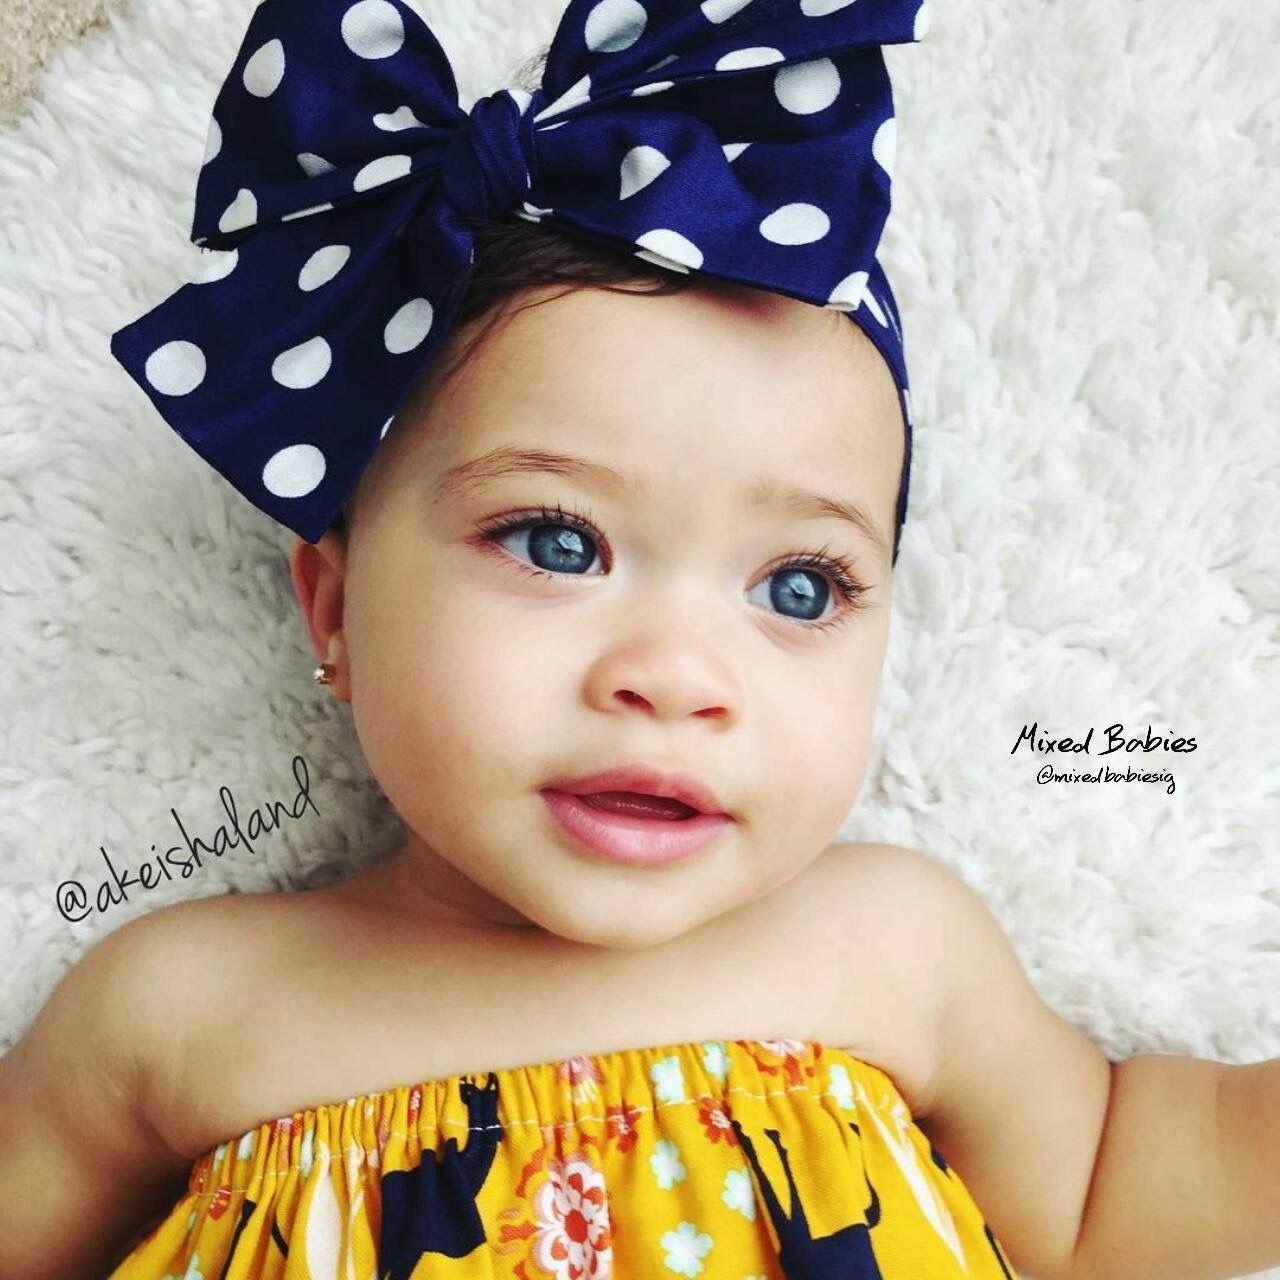 beautiful baby girl | mixed babies | pinterest | beautiful baby girl